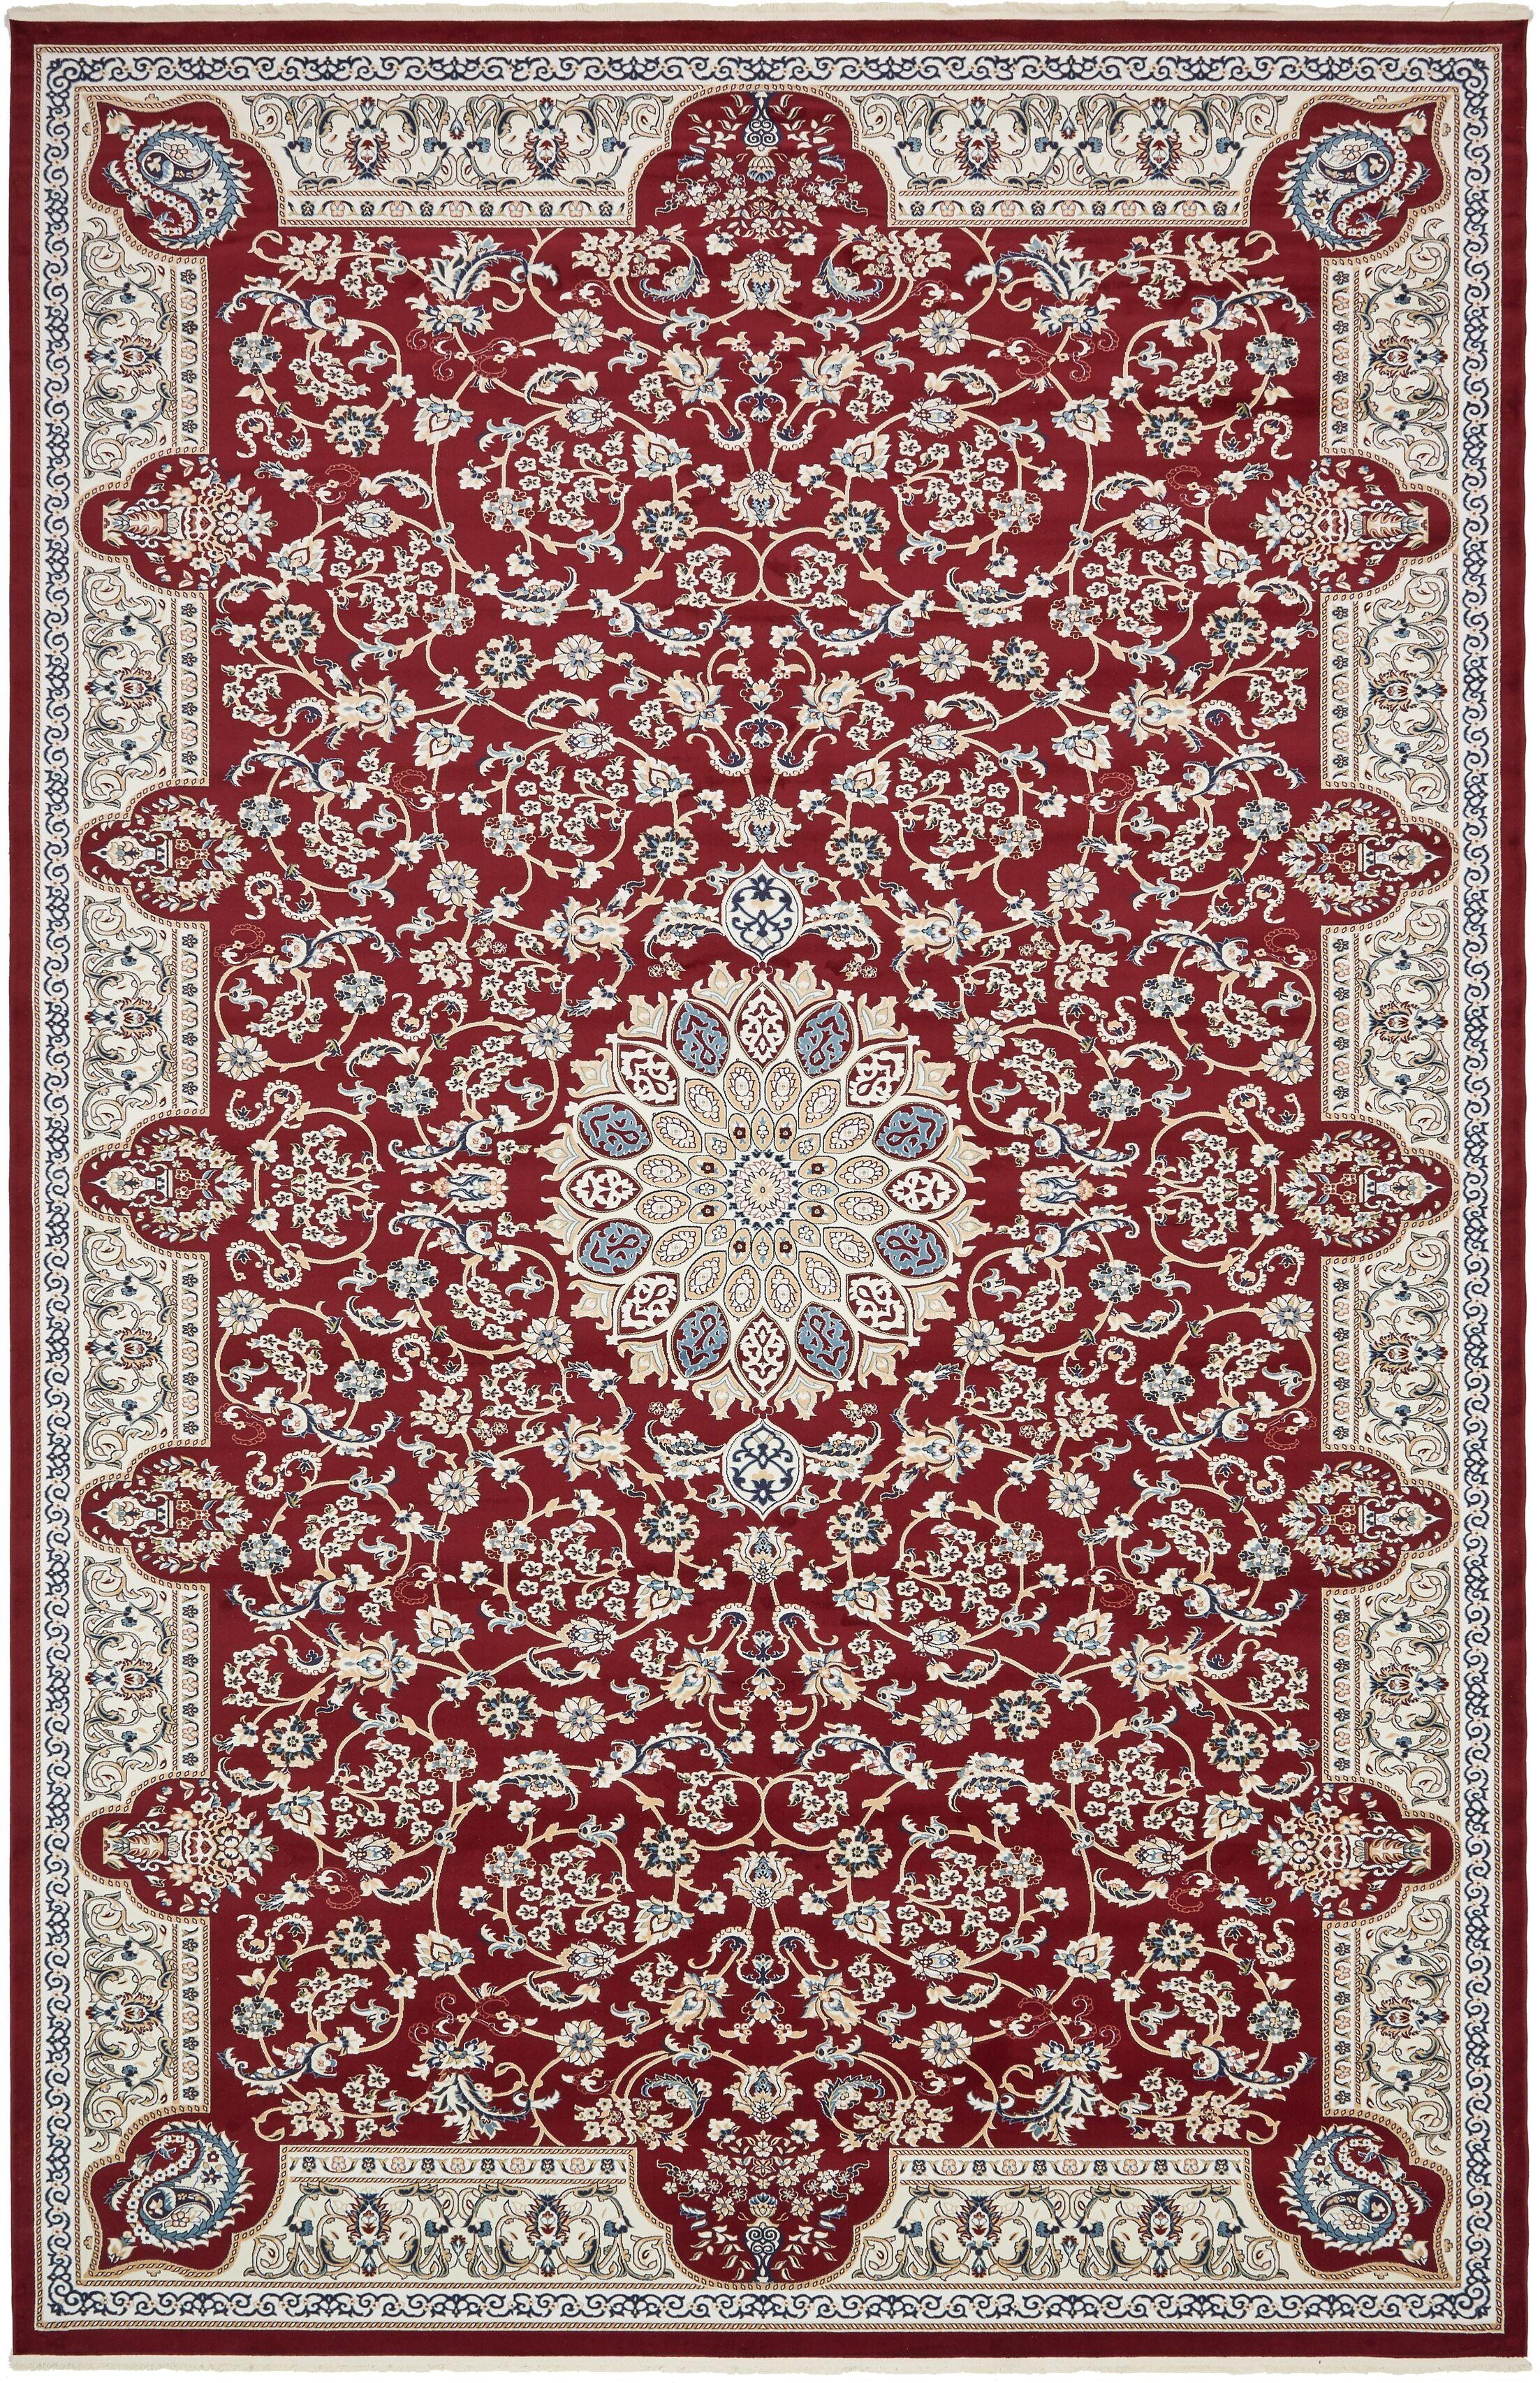 Jackson Burgundy Area Rug Rug Size: Rectangle 13' x 19'8